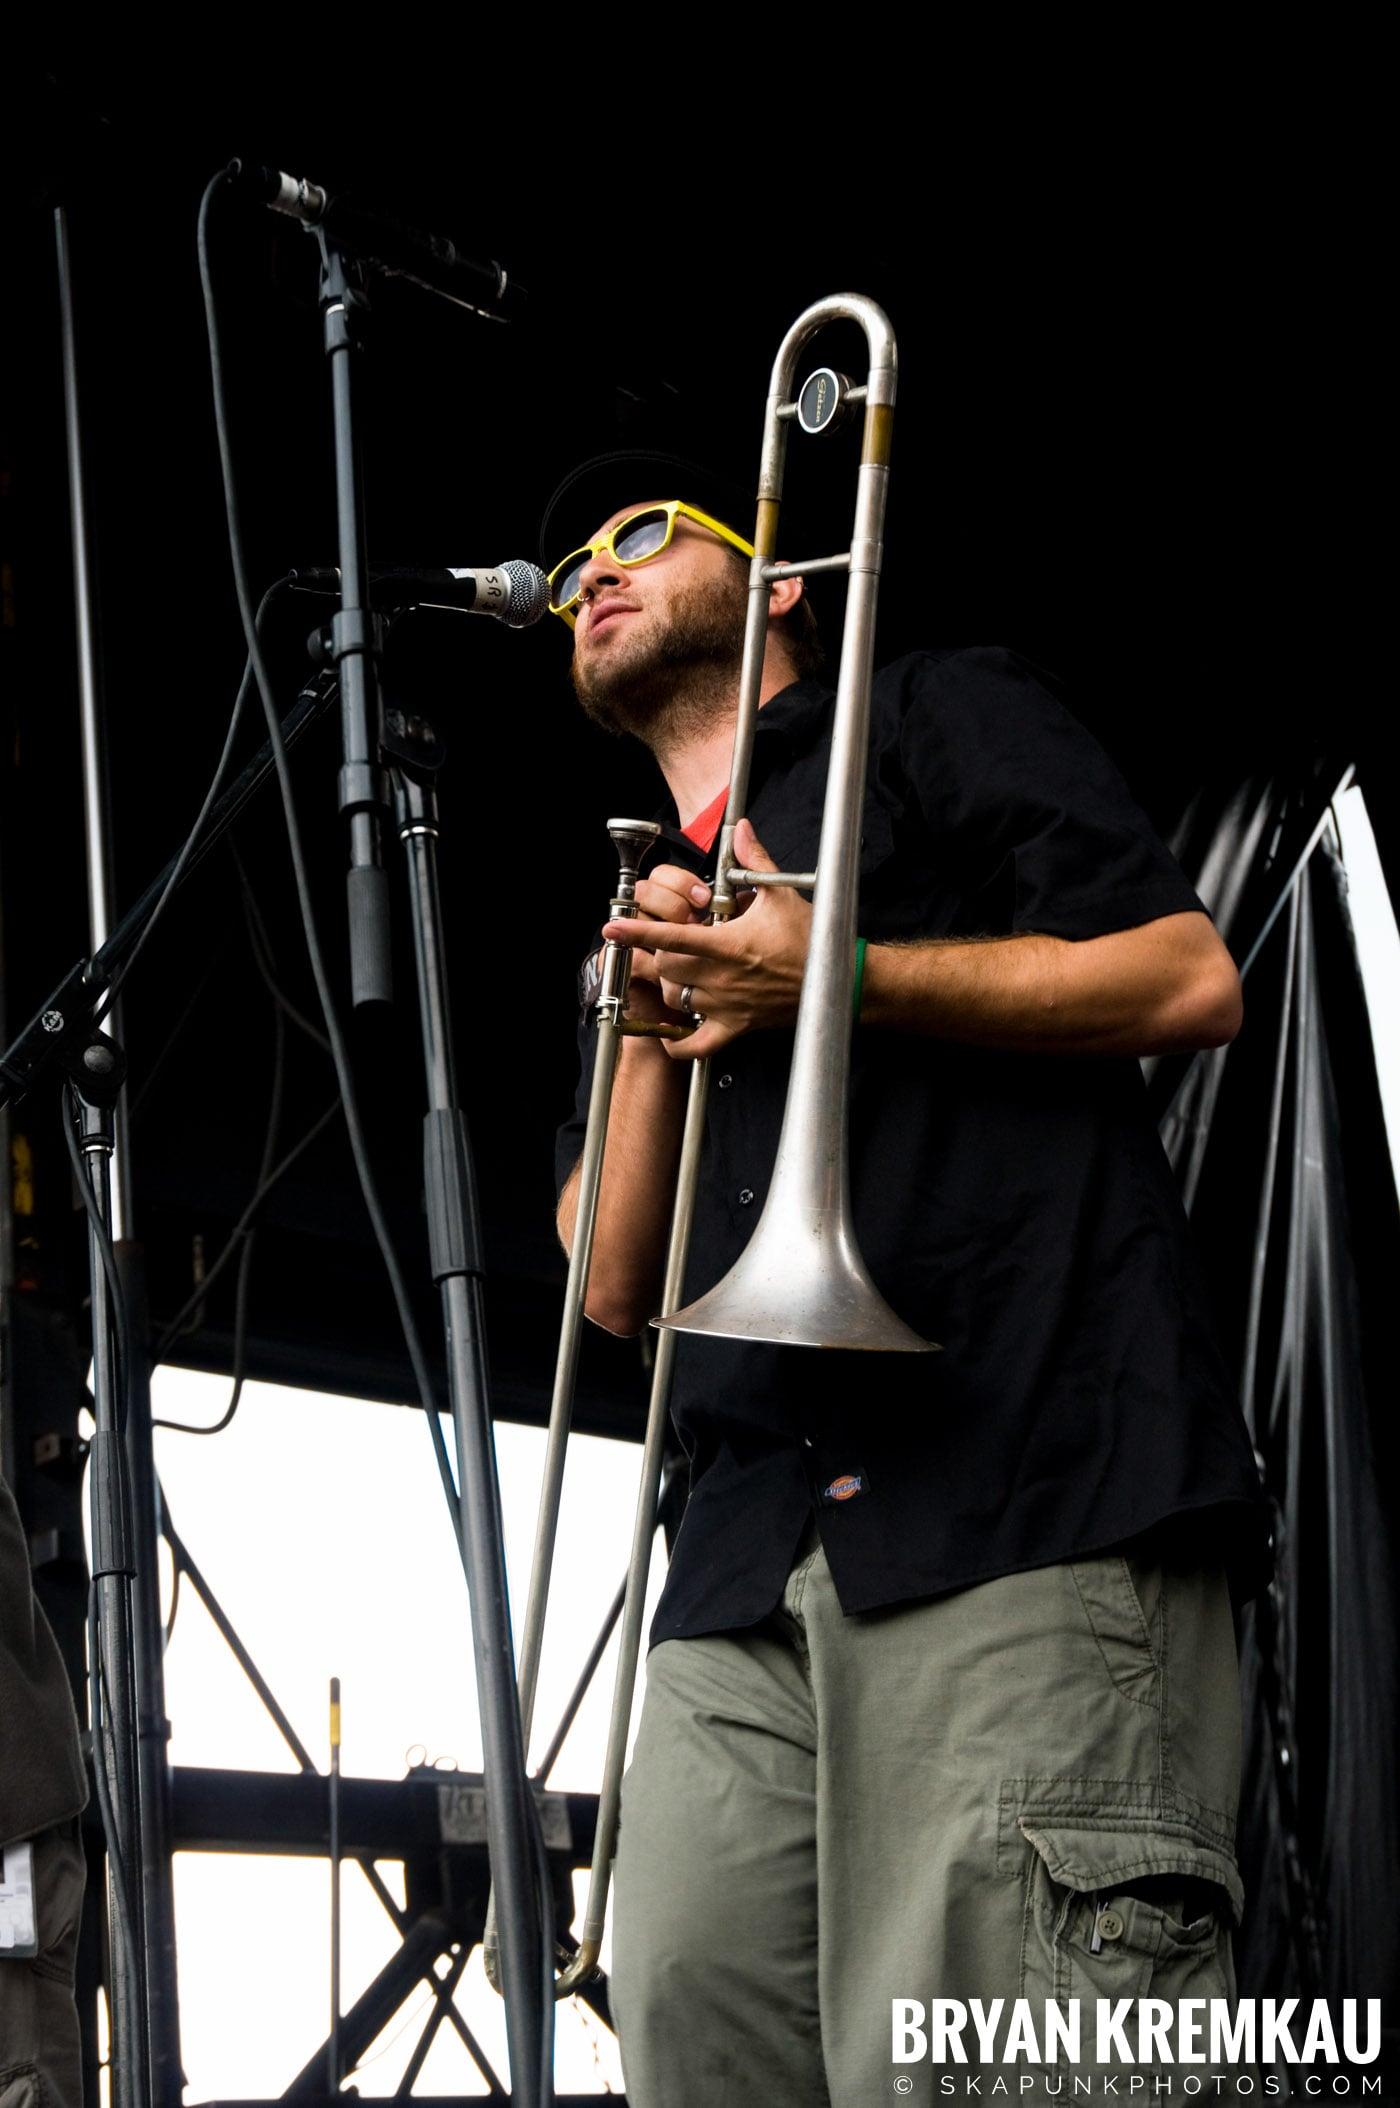 Reel Big Fish @ Warped Tour 08, Scranton PA - 7.27.08 (14)